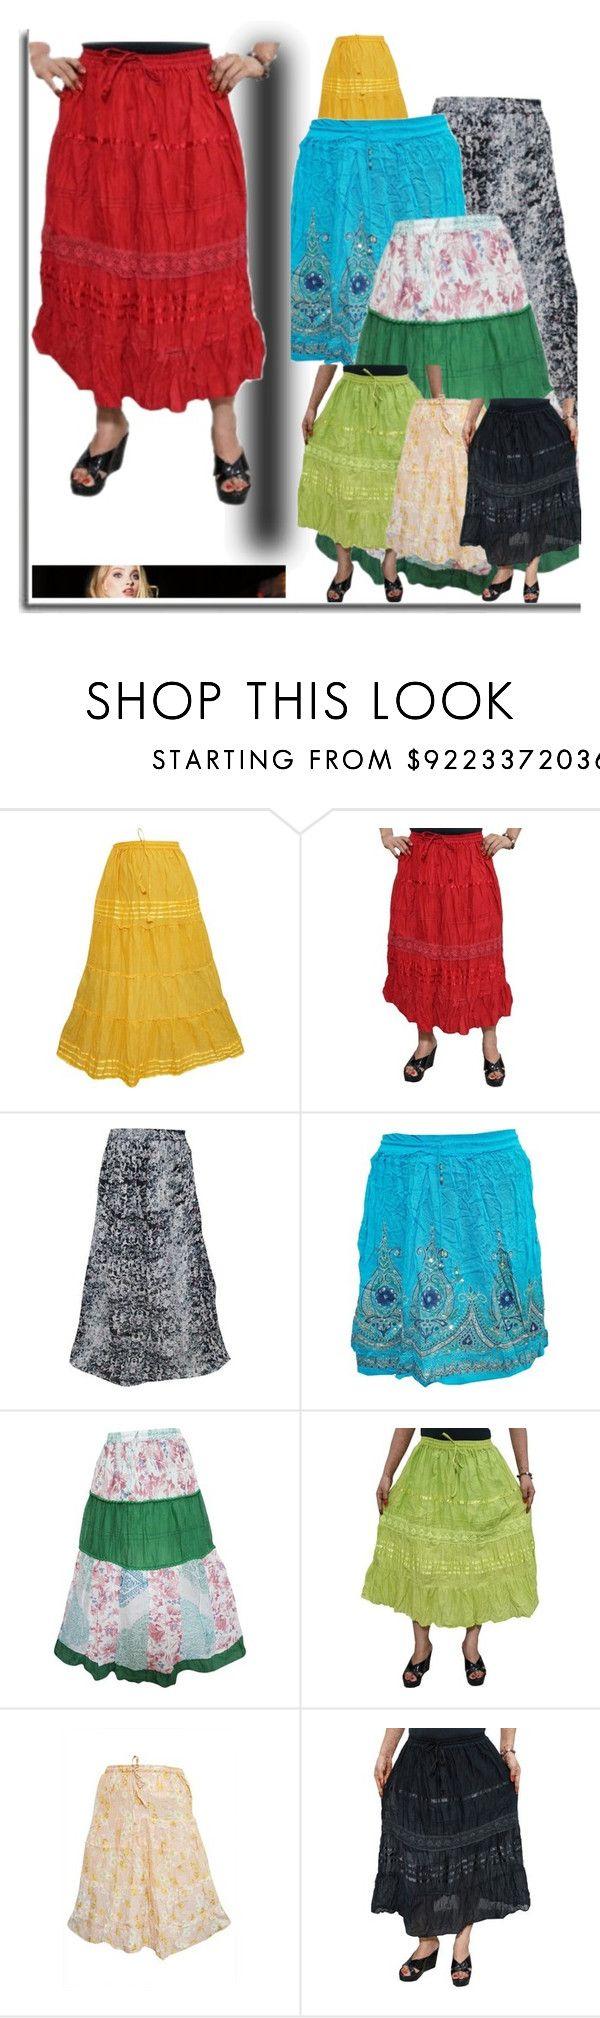 http://www.flipkart.com/womens-clothing/pr?p[]=facets.brand%255B%255D%3DIndiatrendzs&sid=2oq%2Cc1r&filterNone=true #skirts #womens #fancy #longskirts #midiskirts